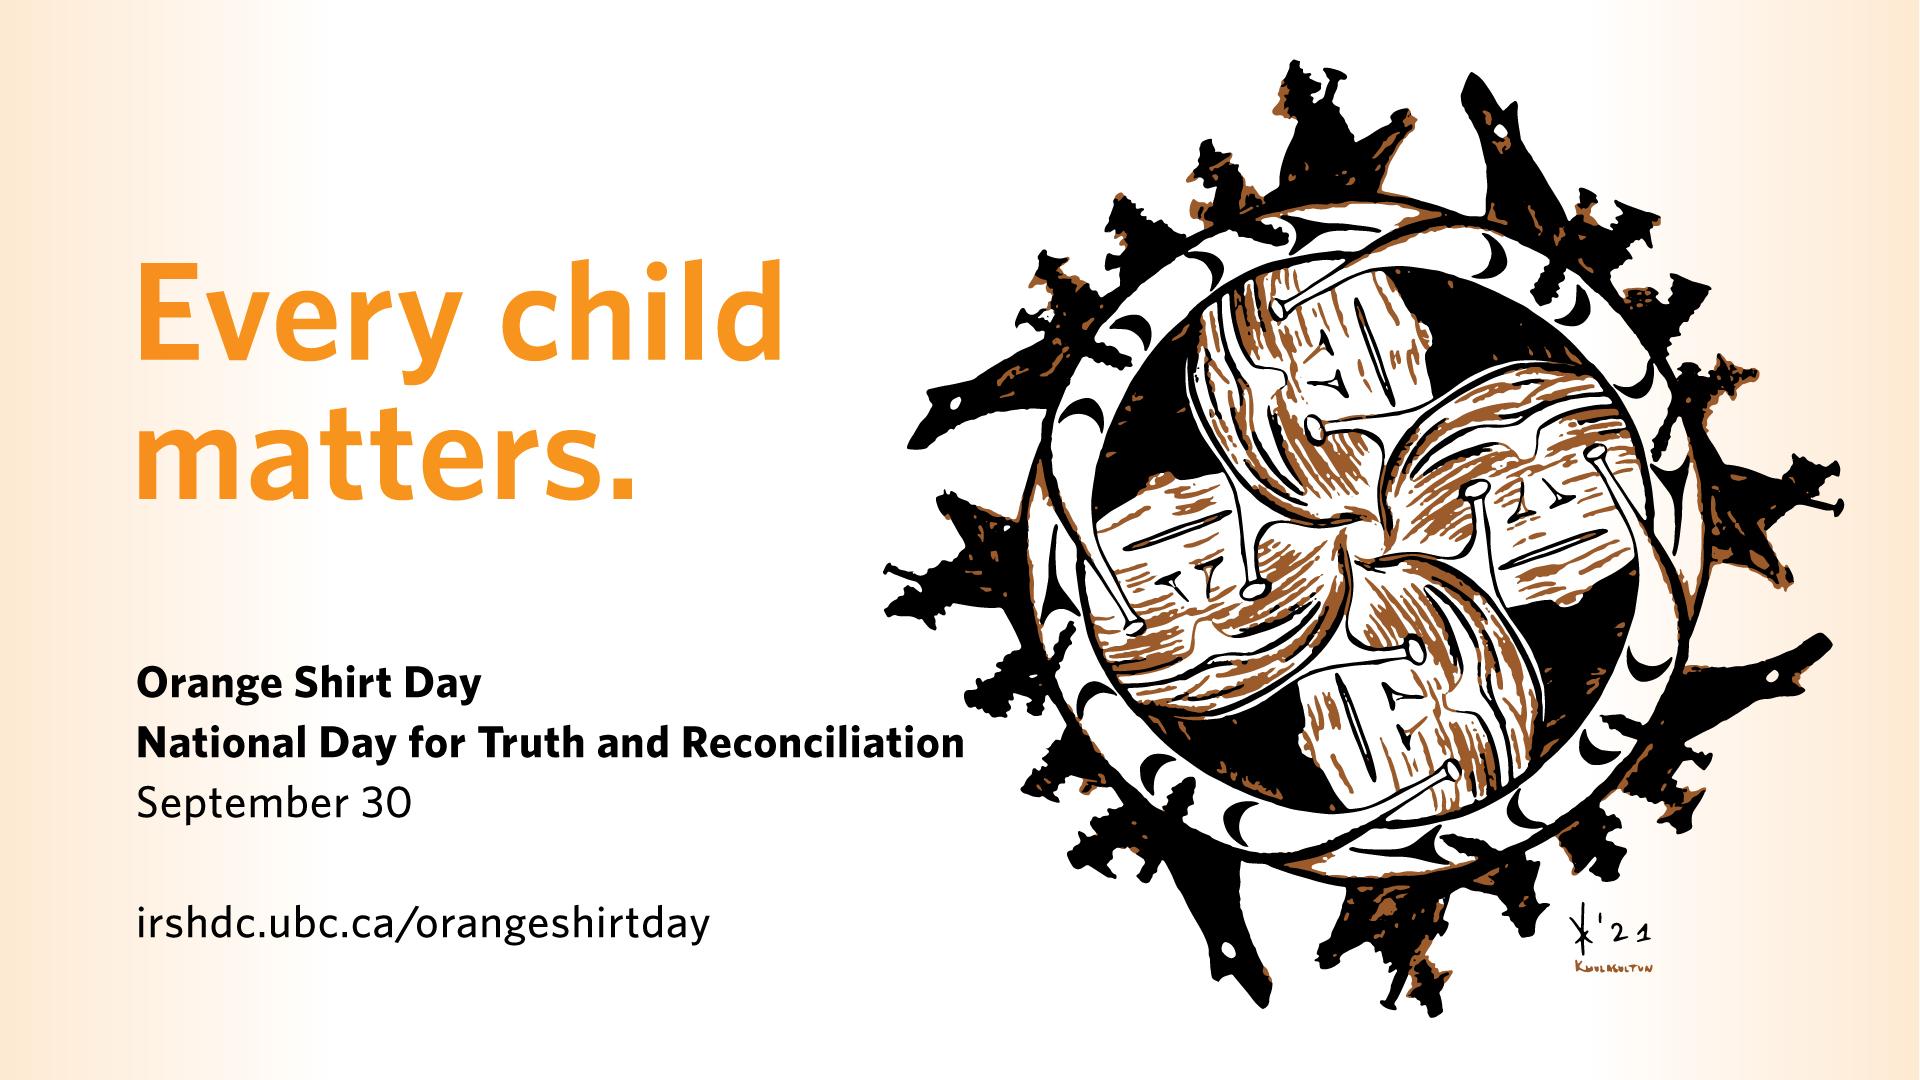 https://ahva.ubc.ca/wp-content/uploads/sites/37/2021/09/Every_Child_Matters-EWH-Social-1920x1080.jpg